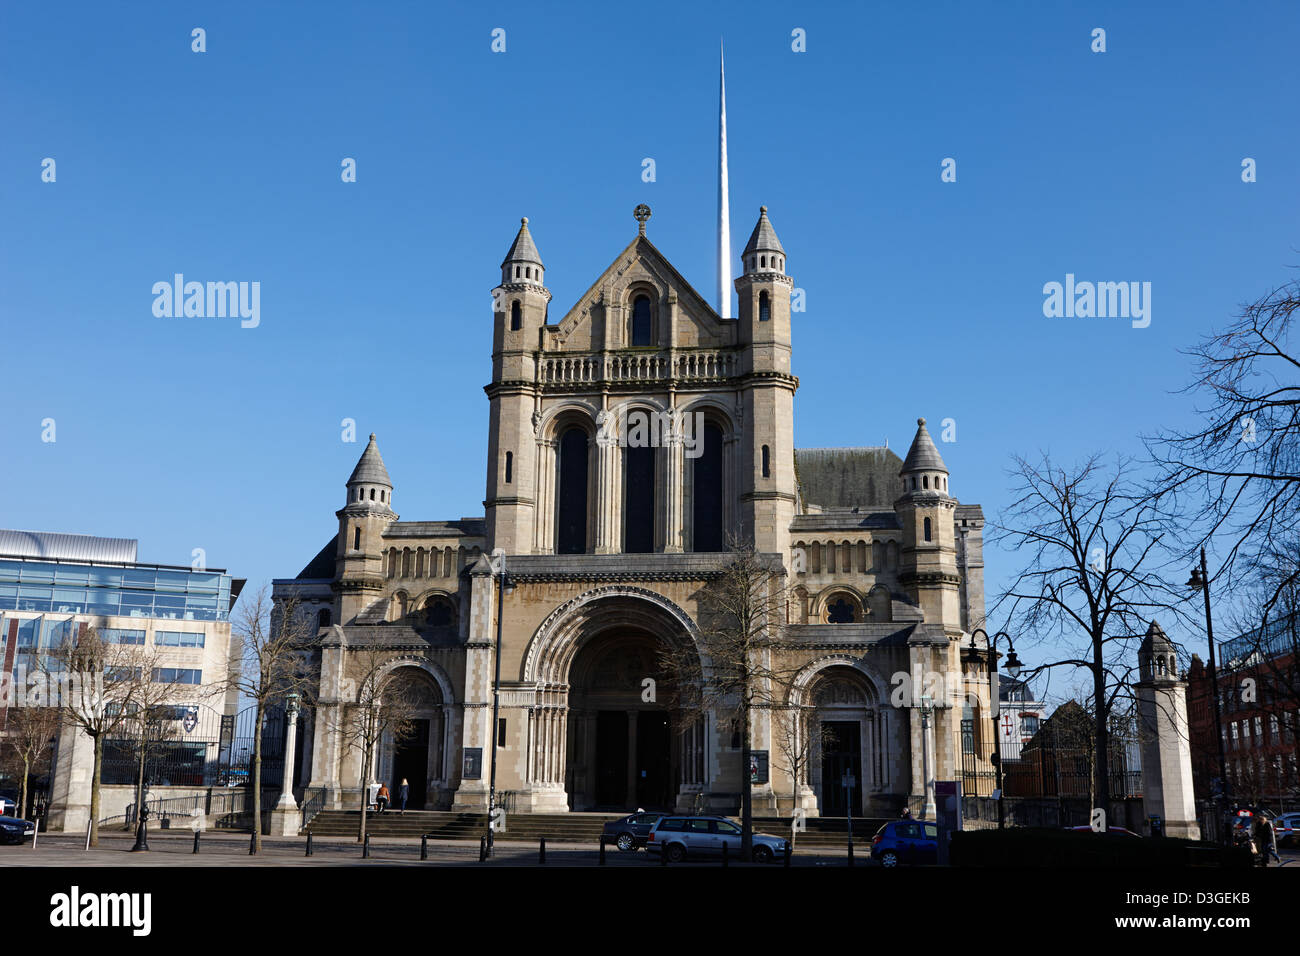 saint annes belfast cathedral Belfast Northern Ireland uk - Stock Image